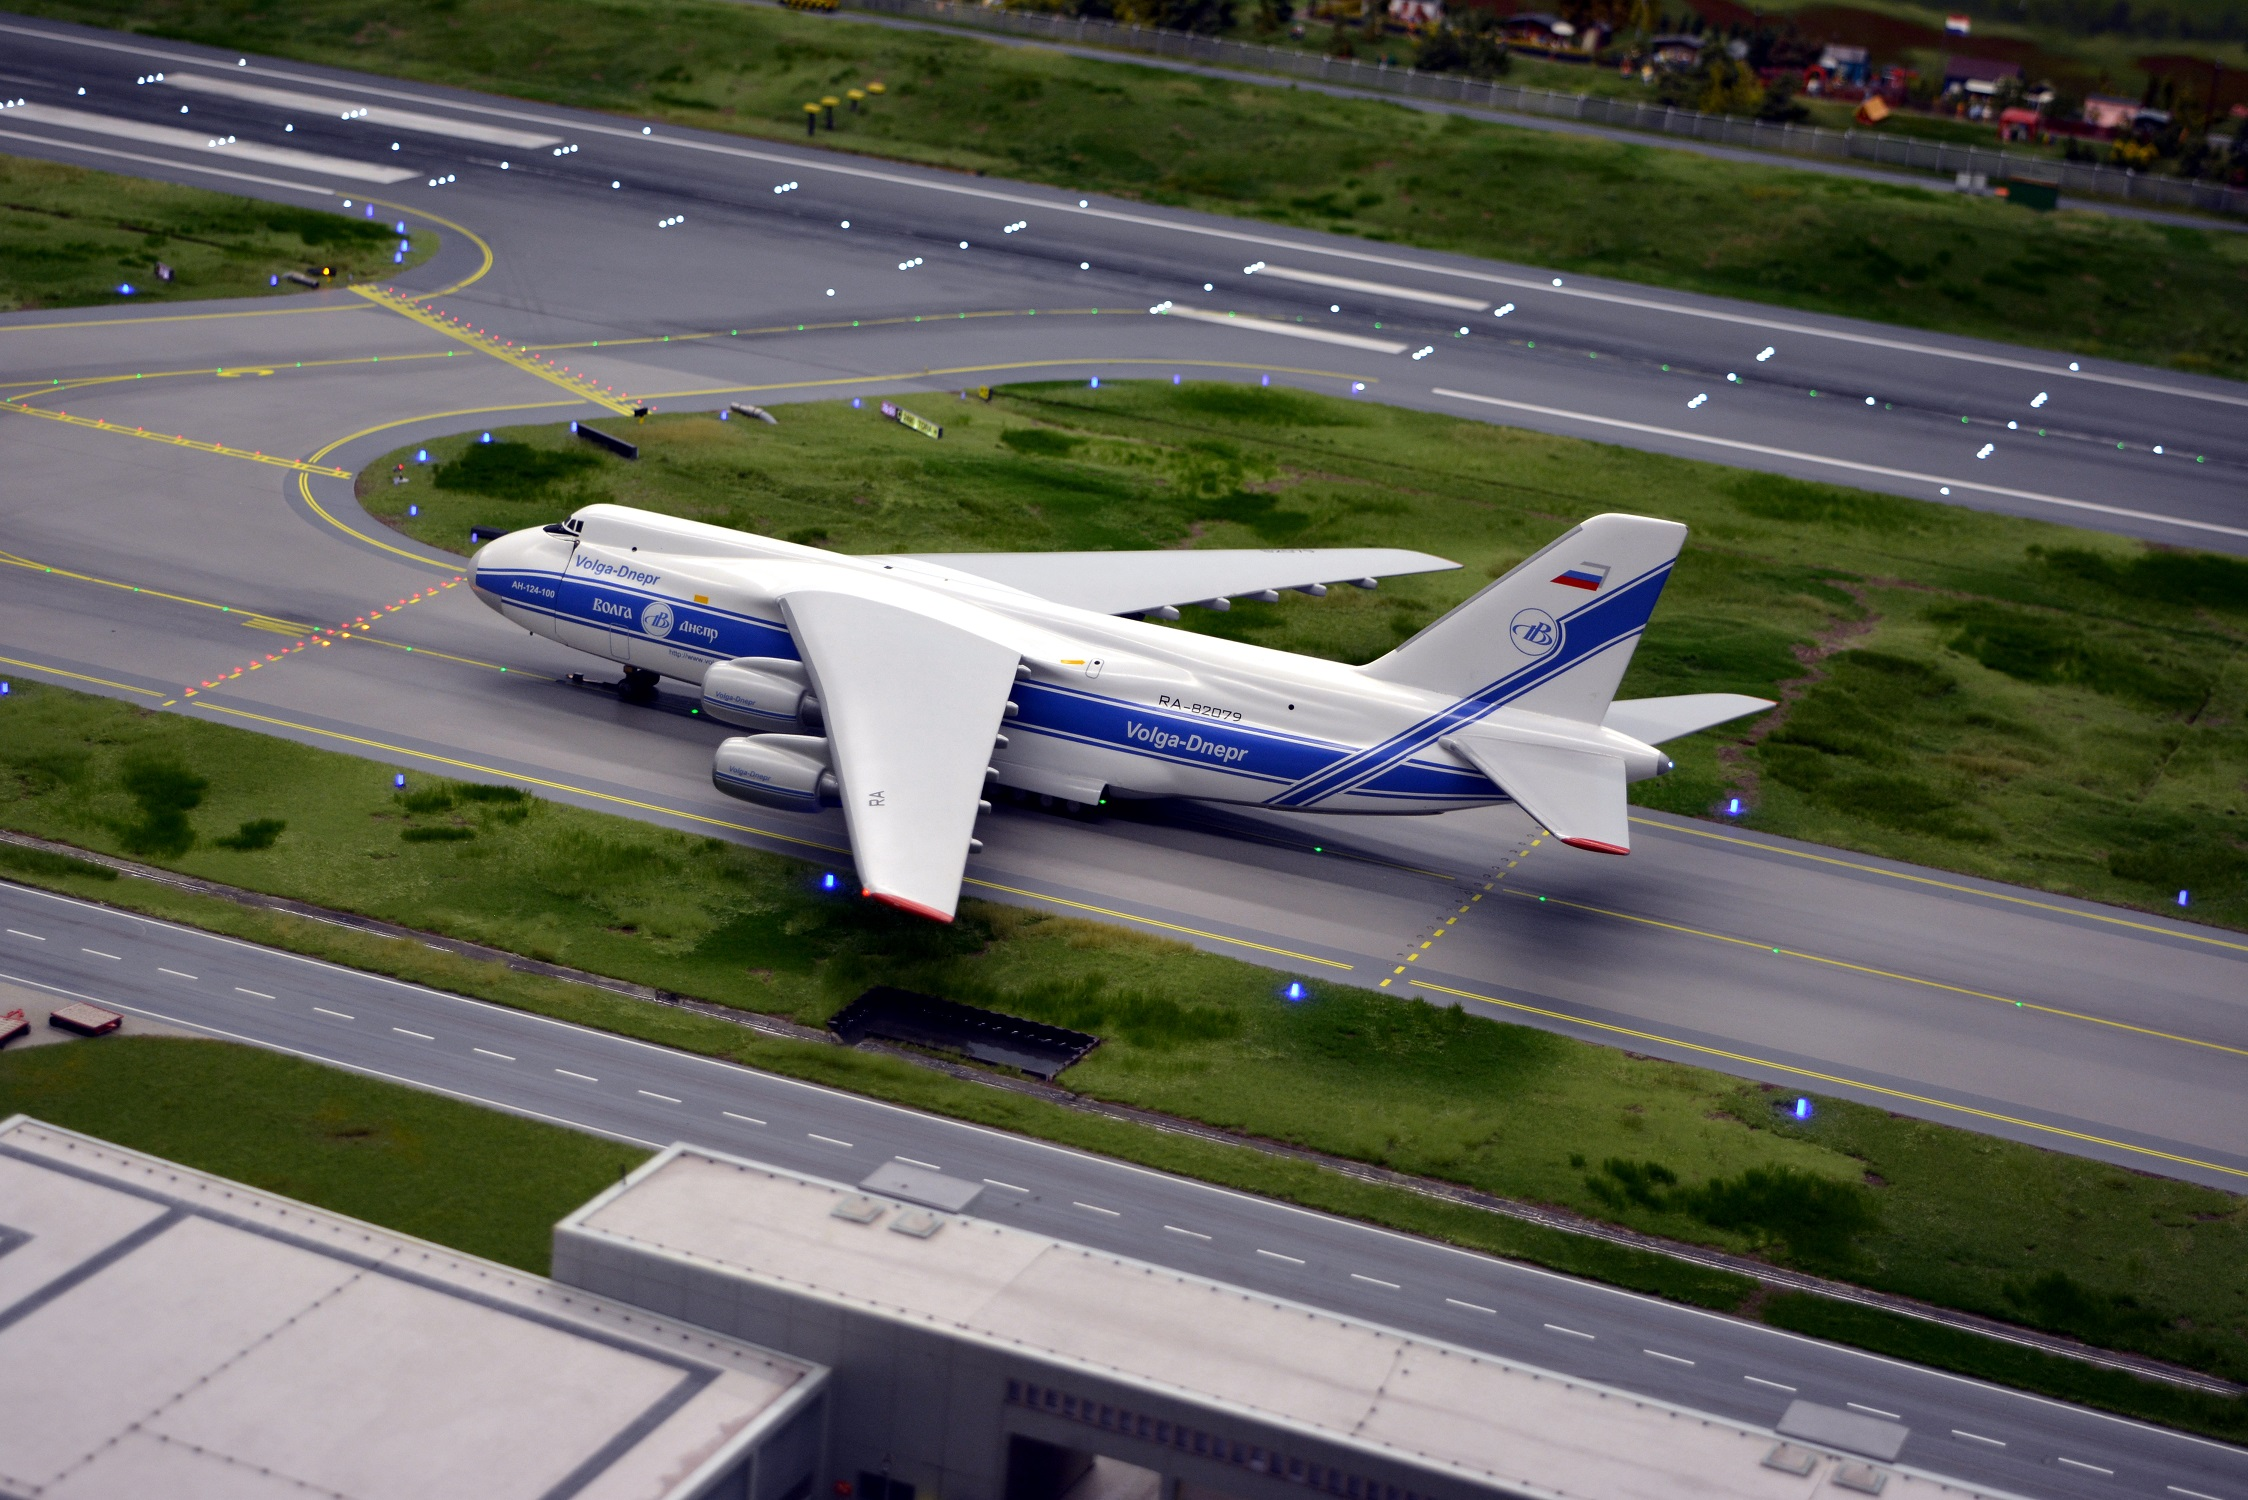 26 Miniatur Wunderland Antonov 01.jpg